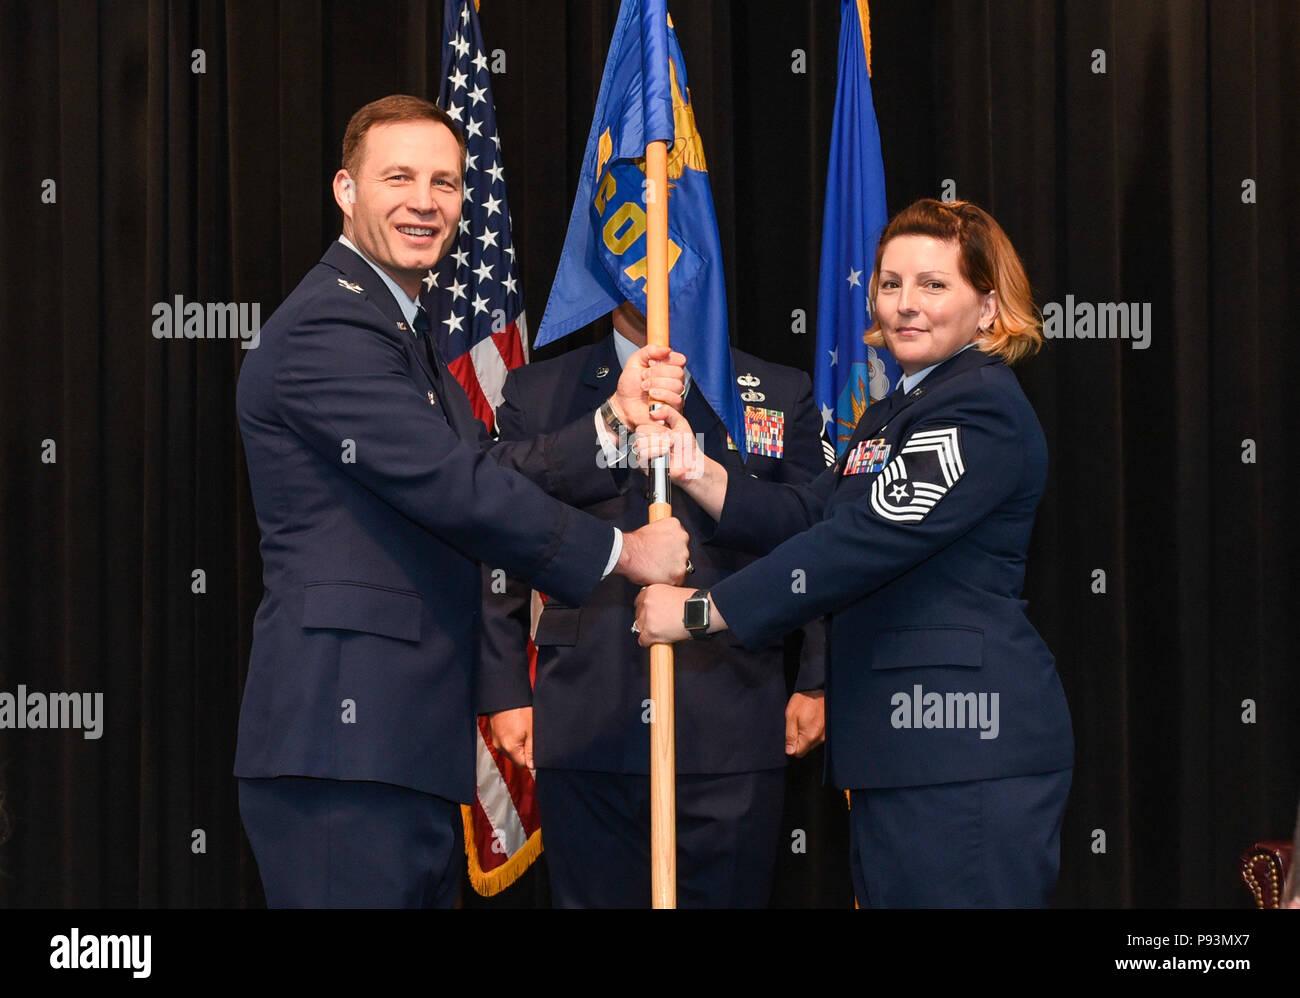 U.S. Air Force Col. James Dryjanski, Thomas N. Barnes ...